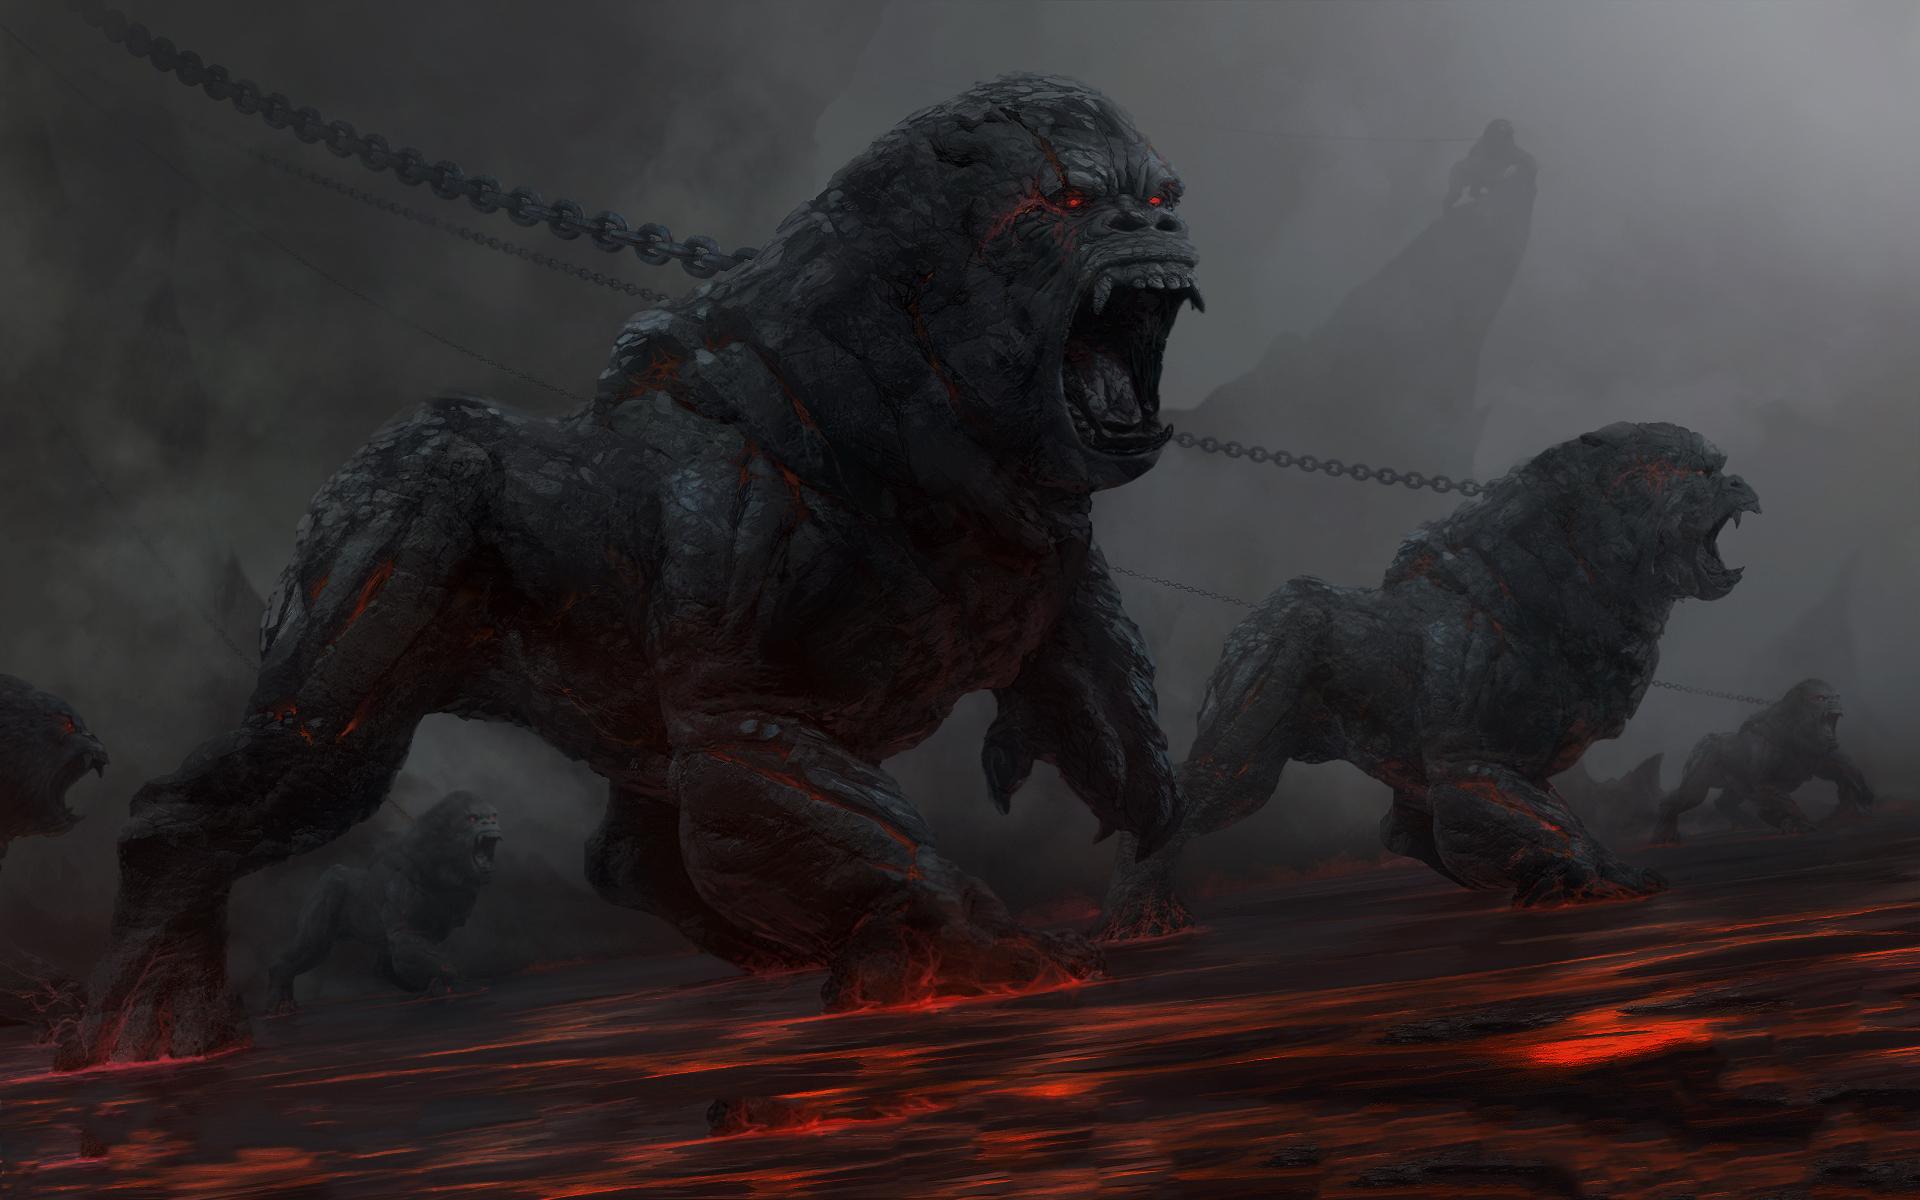 Gorilla lion demons